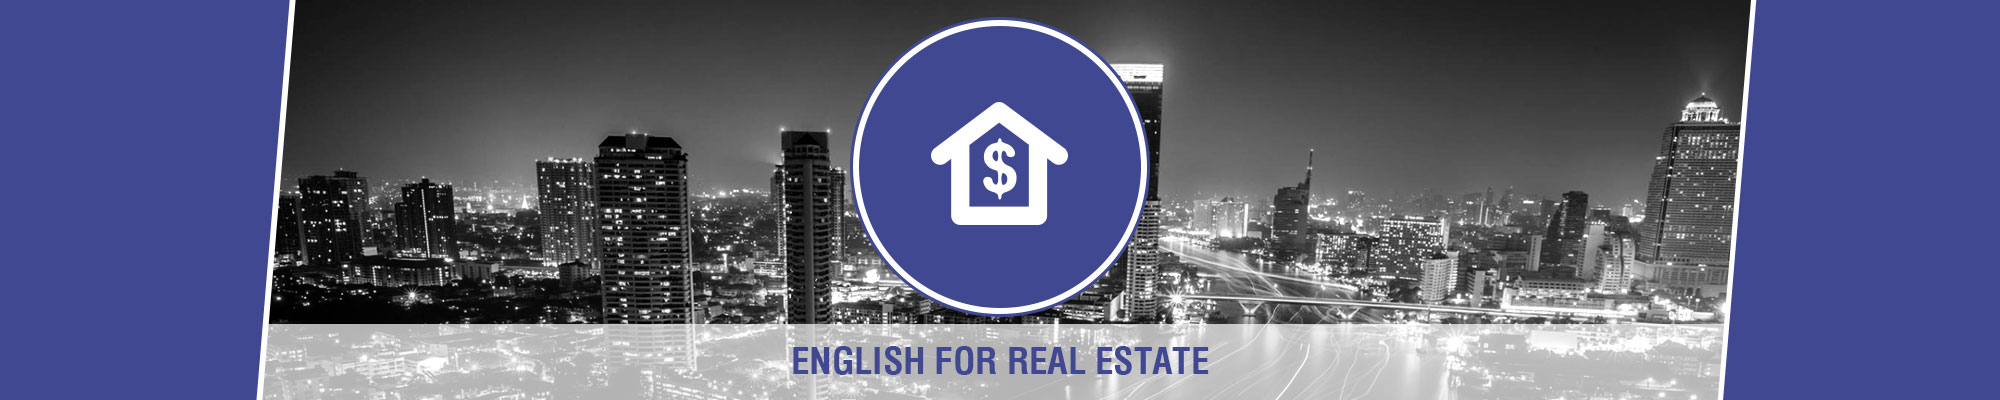 Anglokom Corporate Language Training Bangkok - English for Real-Estate Banner